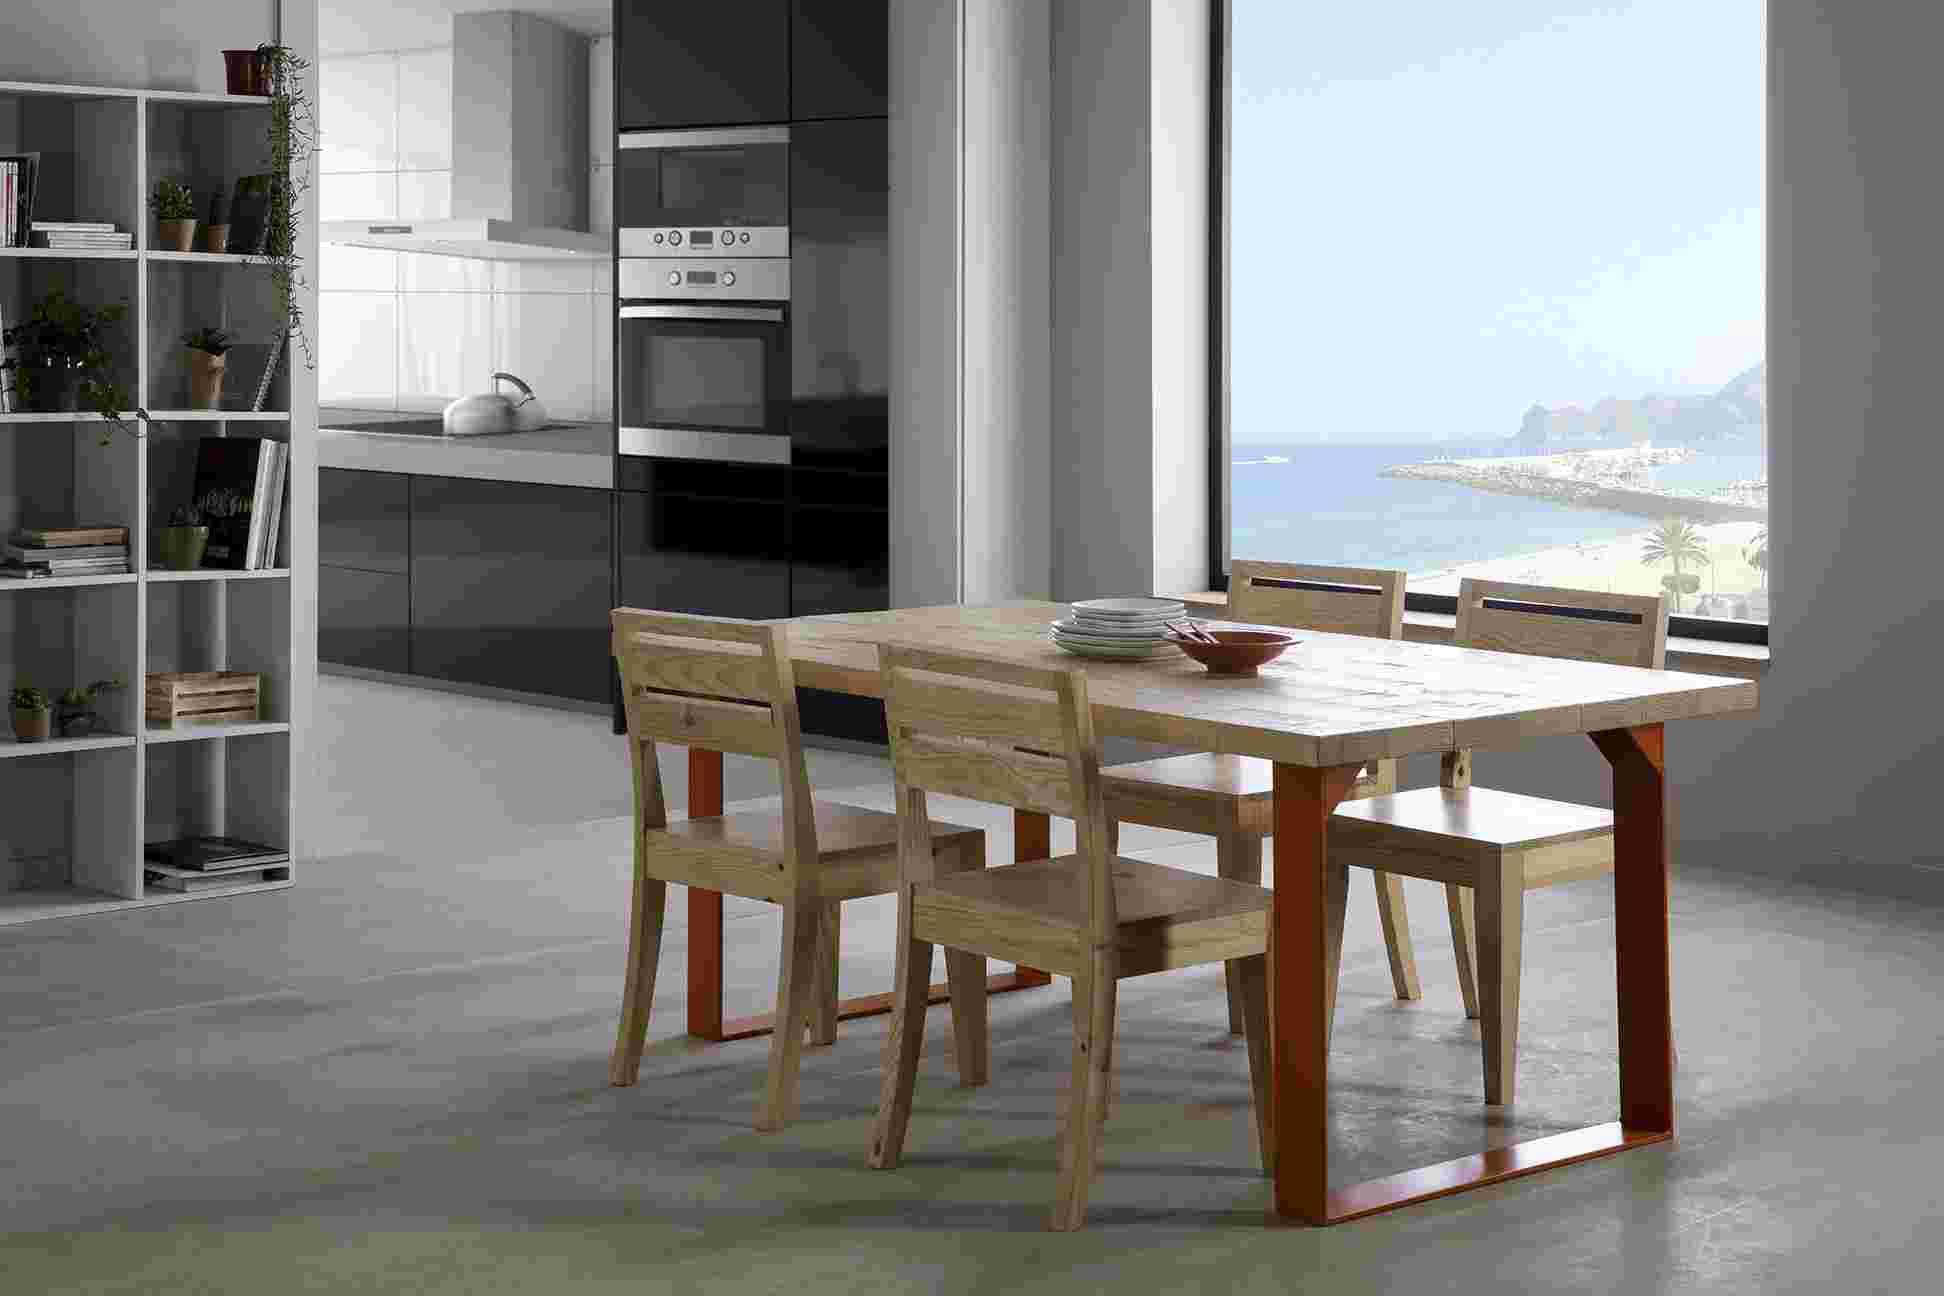 ambiente salon rústico mesa madera pata forja